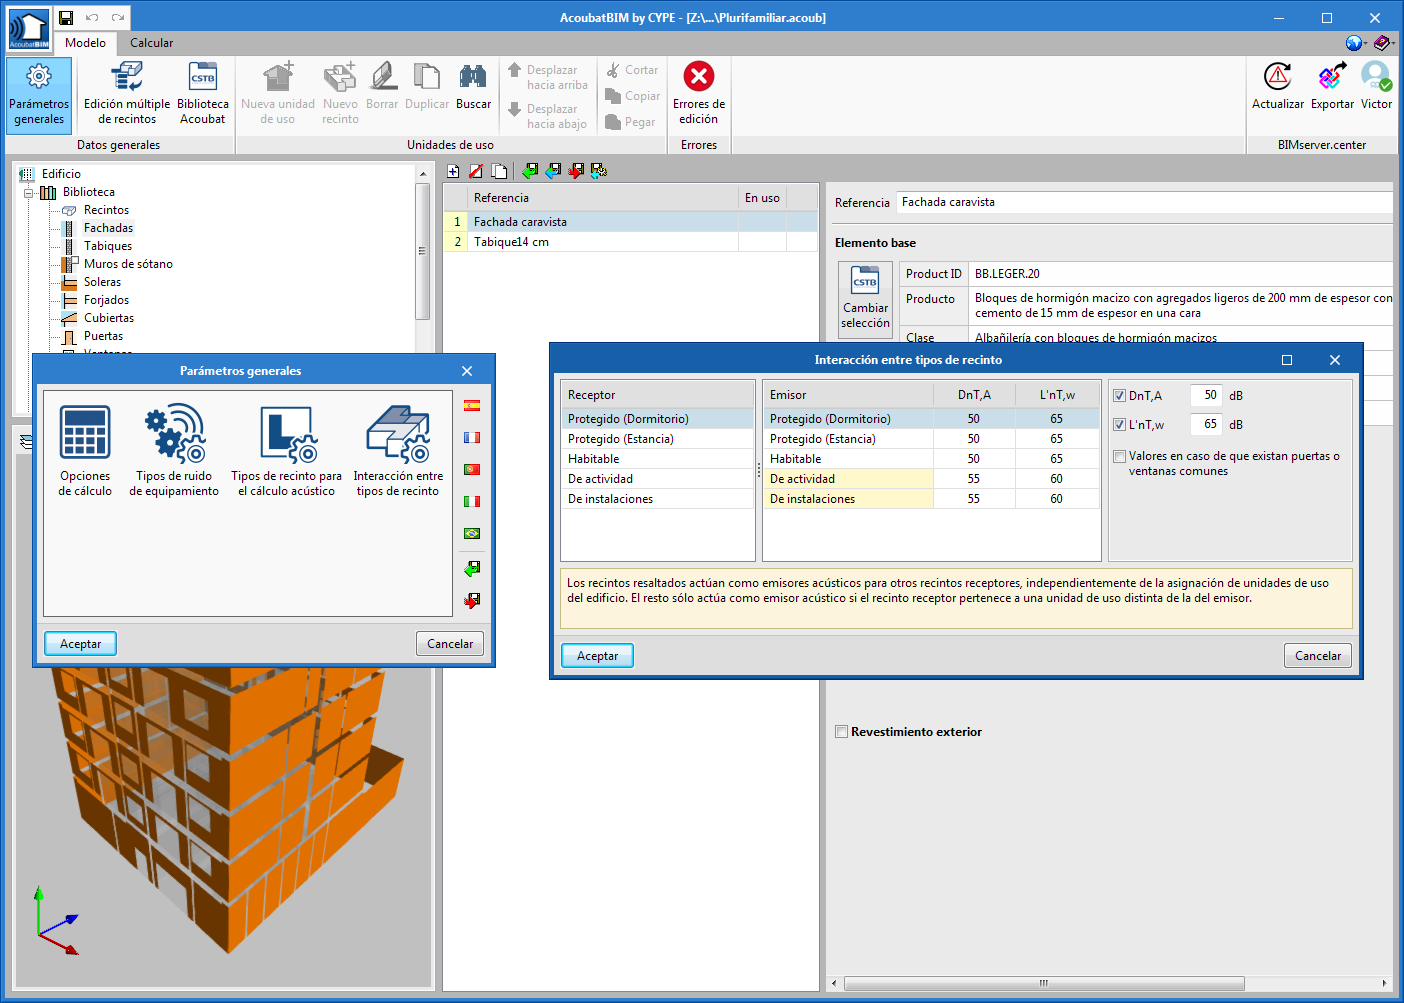 AcoubatBIM by CYPE. Code implementation: CTE DB HR (Spain)